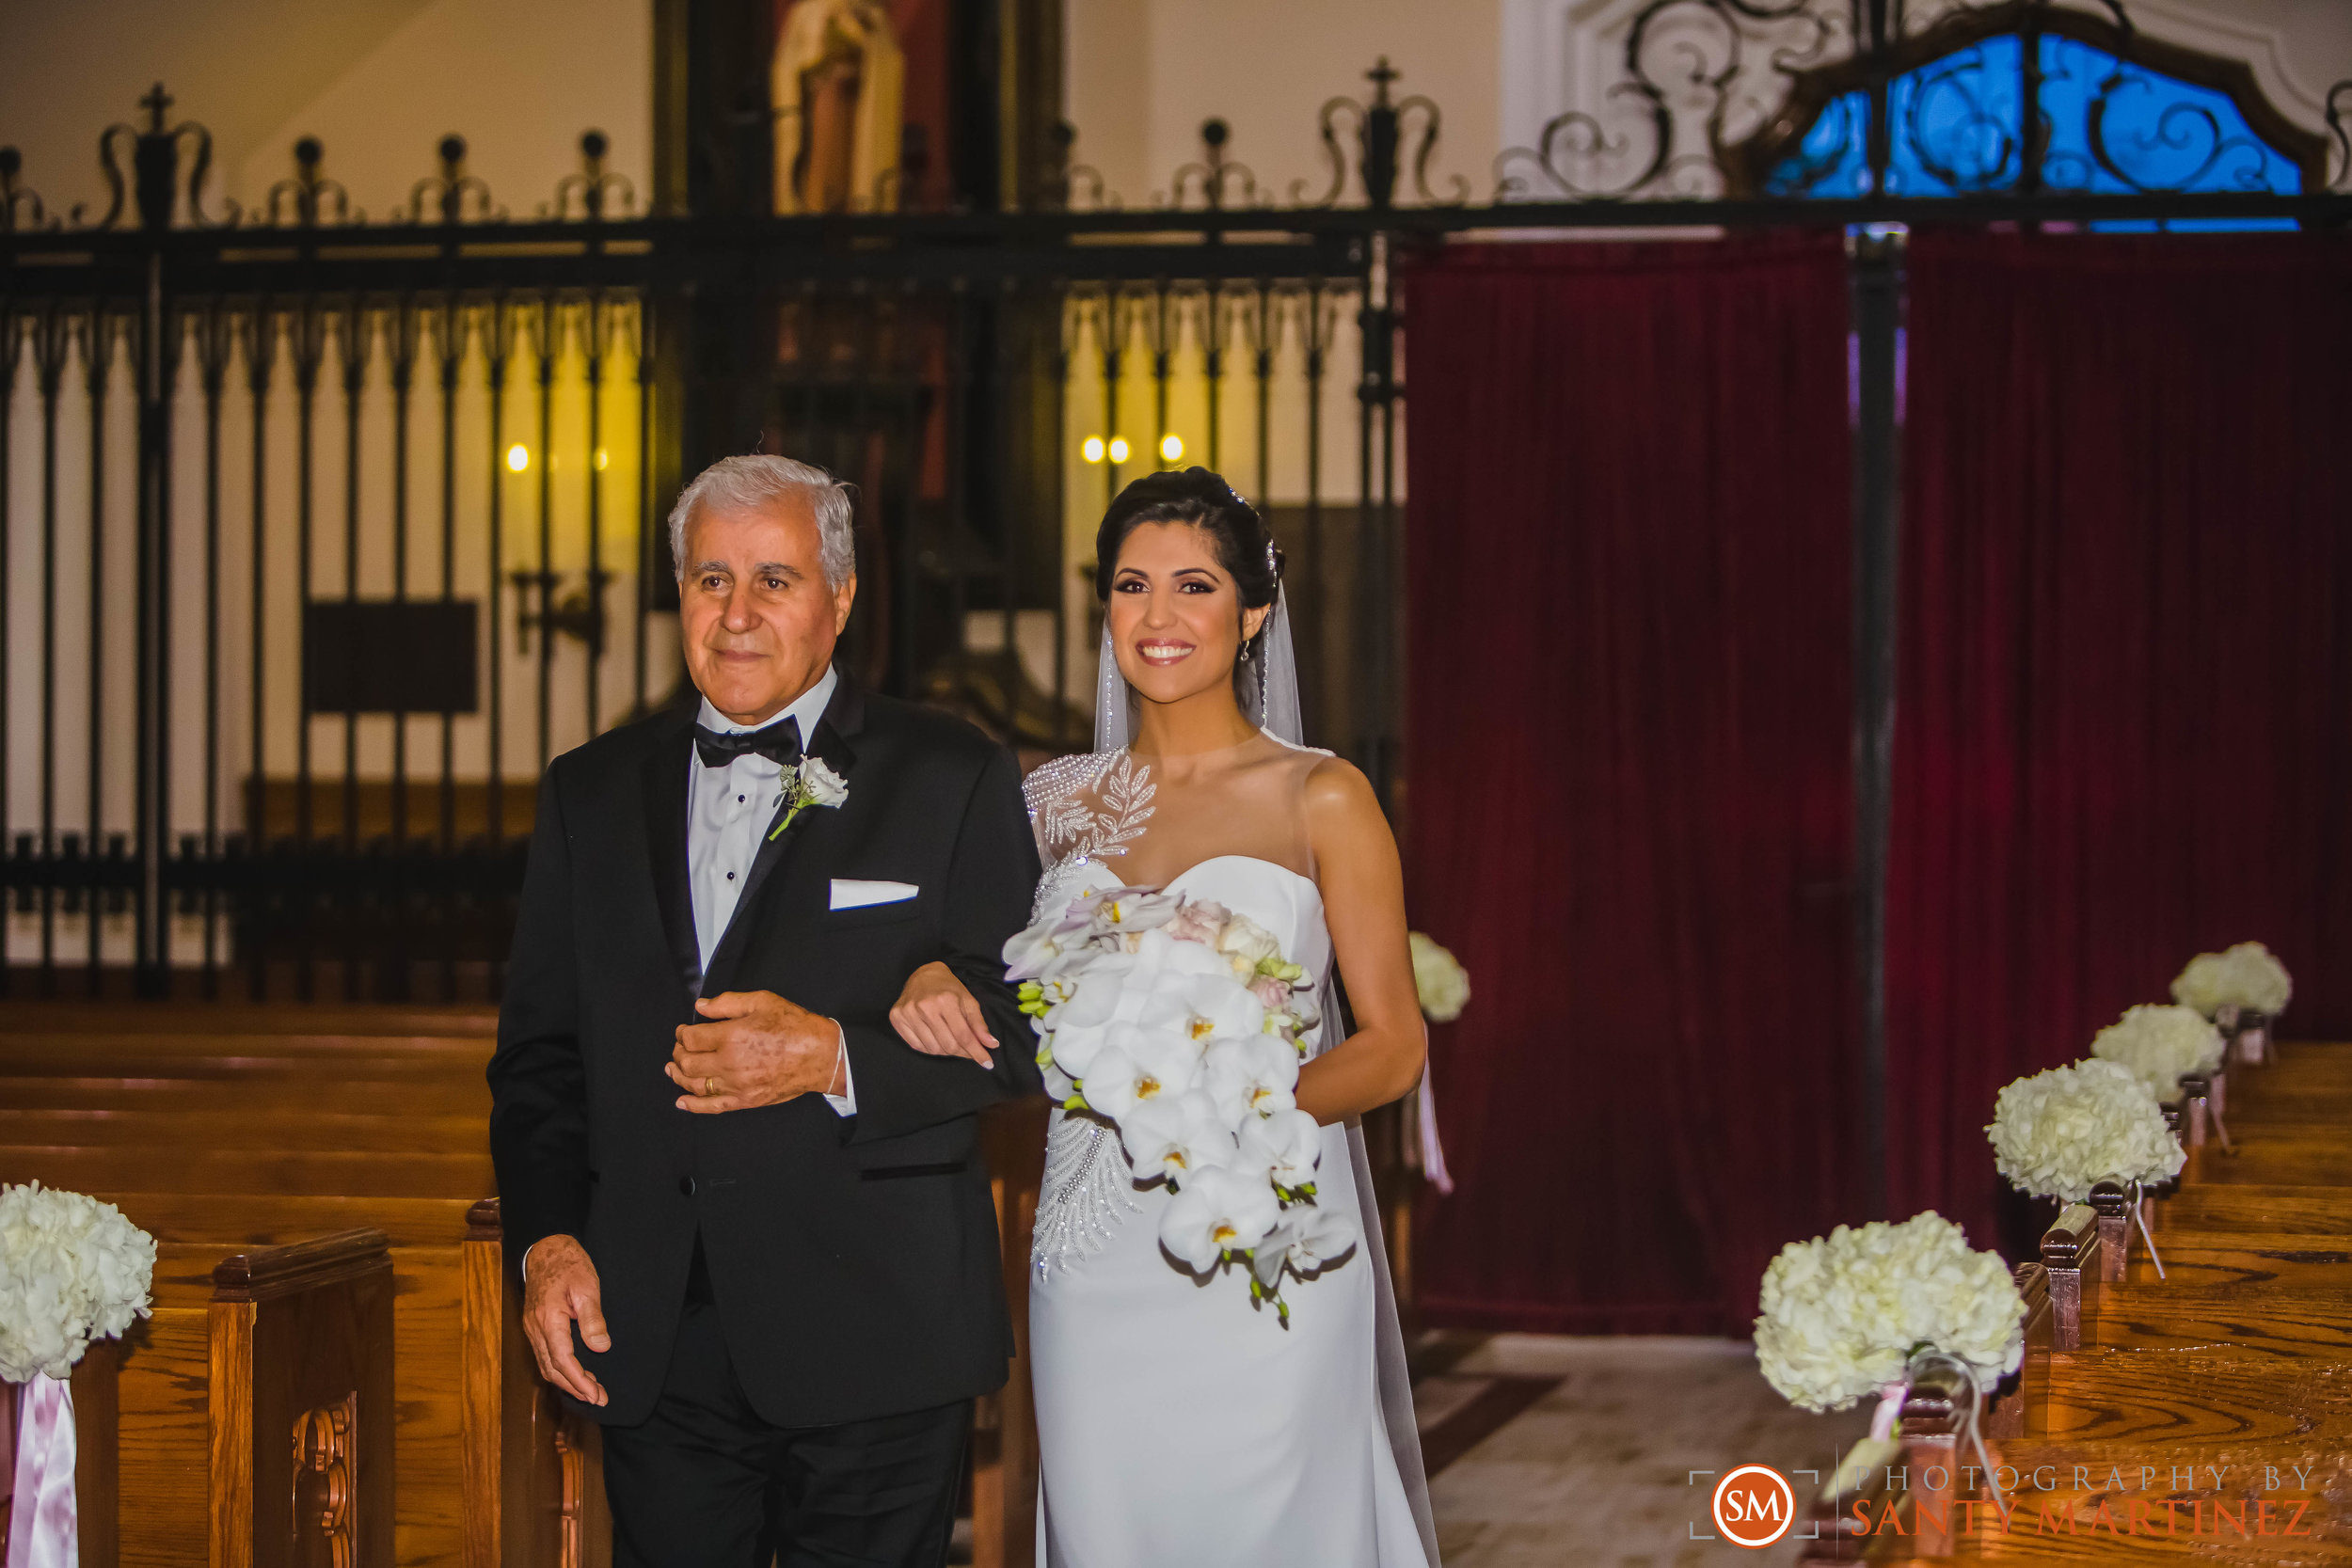 Wedding Trump National Doral Miami - Photography by Santy Martinez-12.jpg